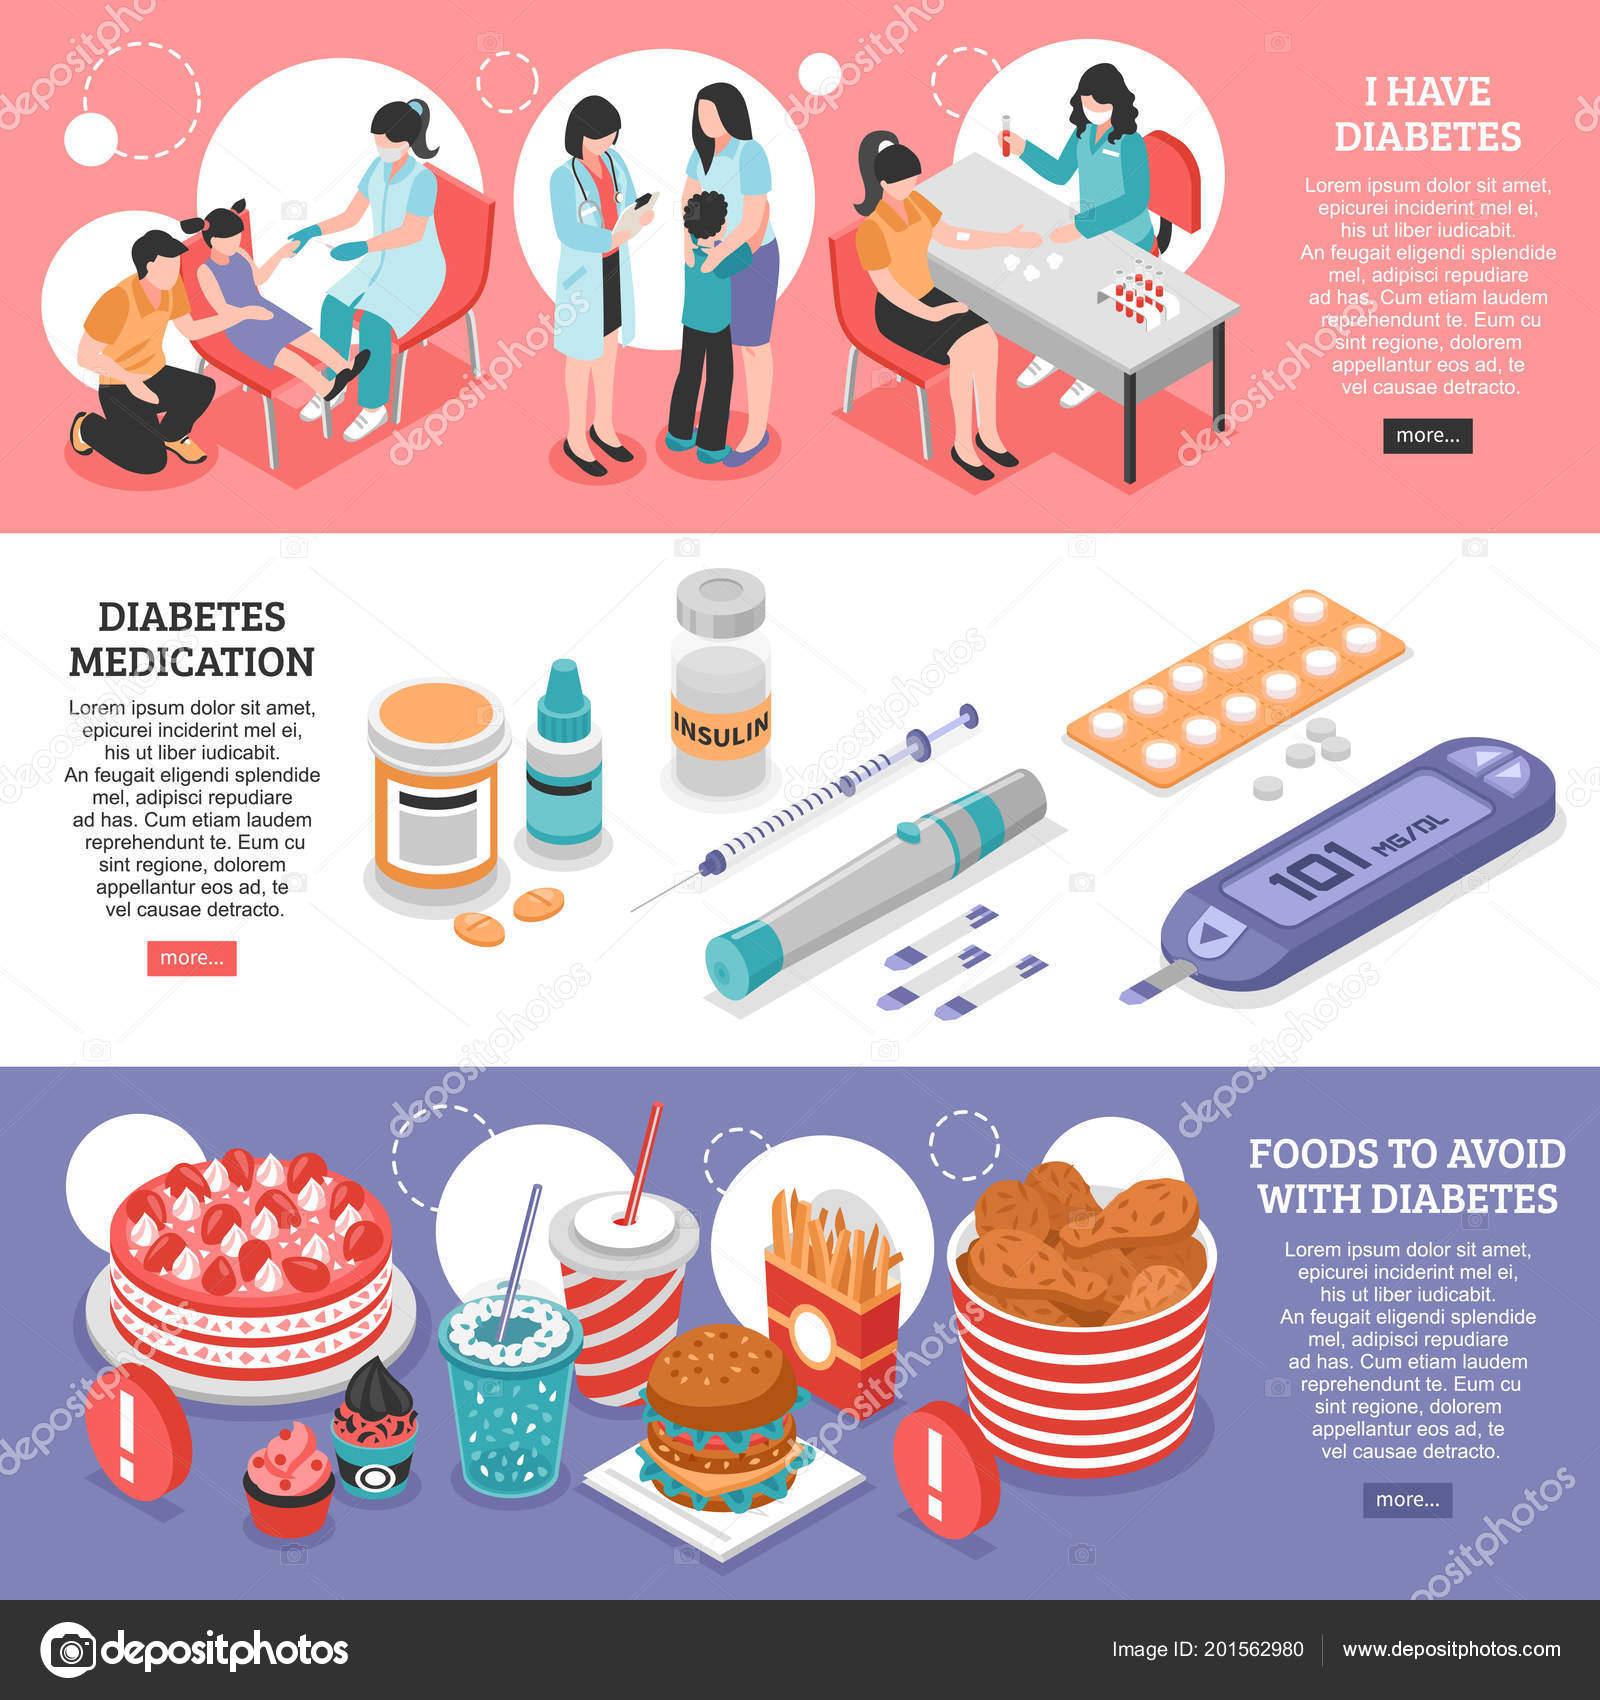 dieta para evitar la diabetes